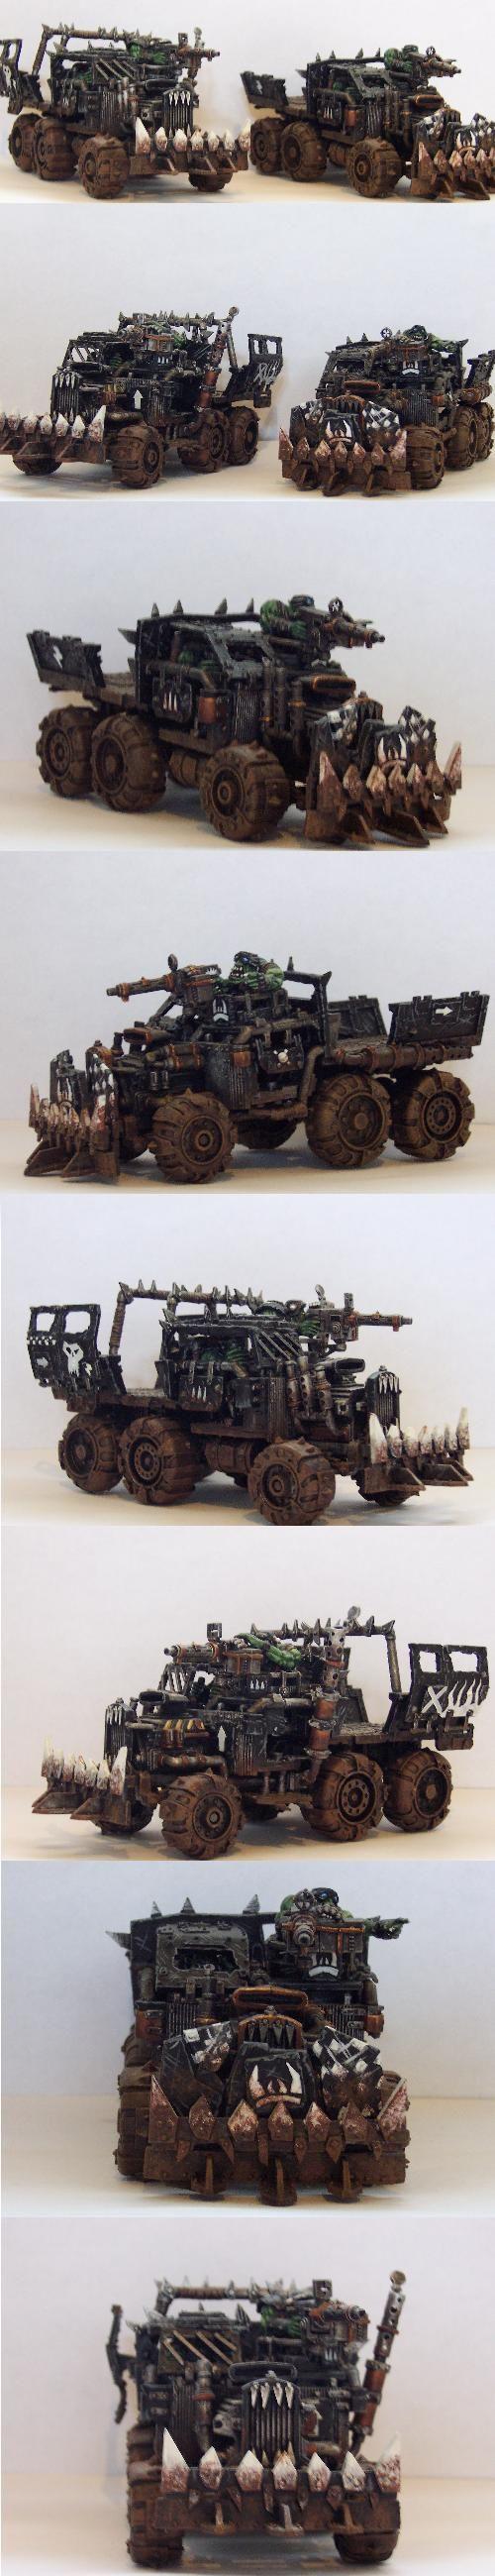 Ork Trukks